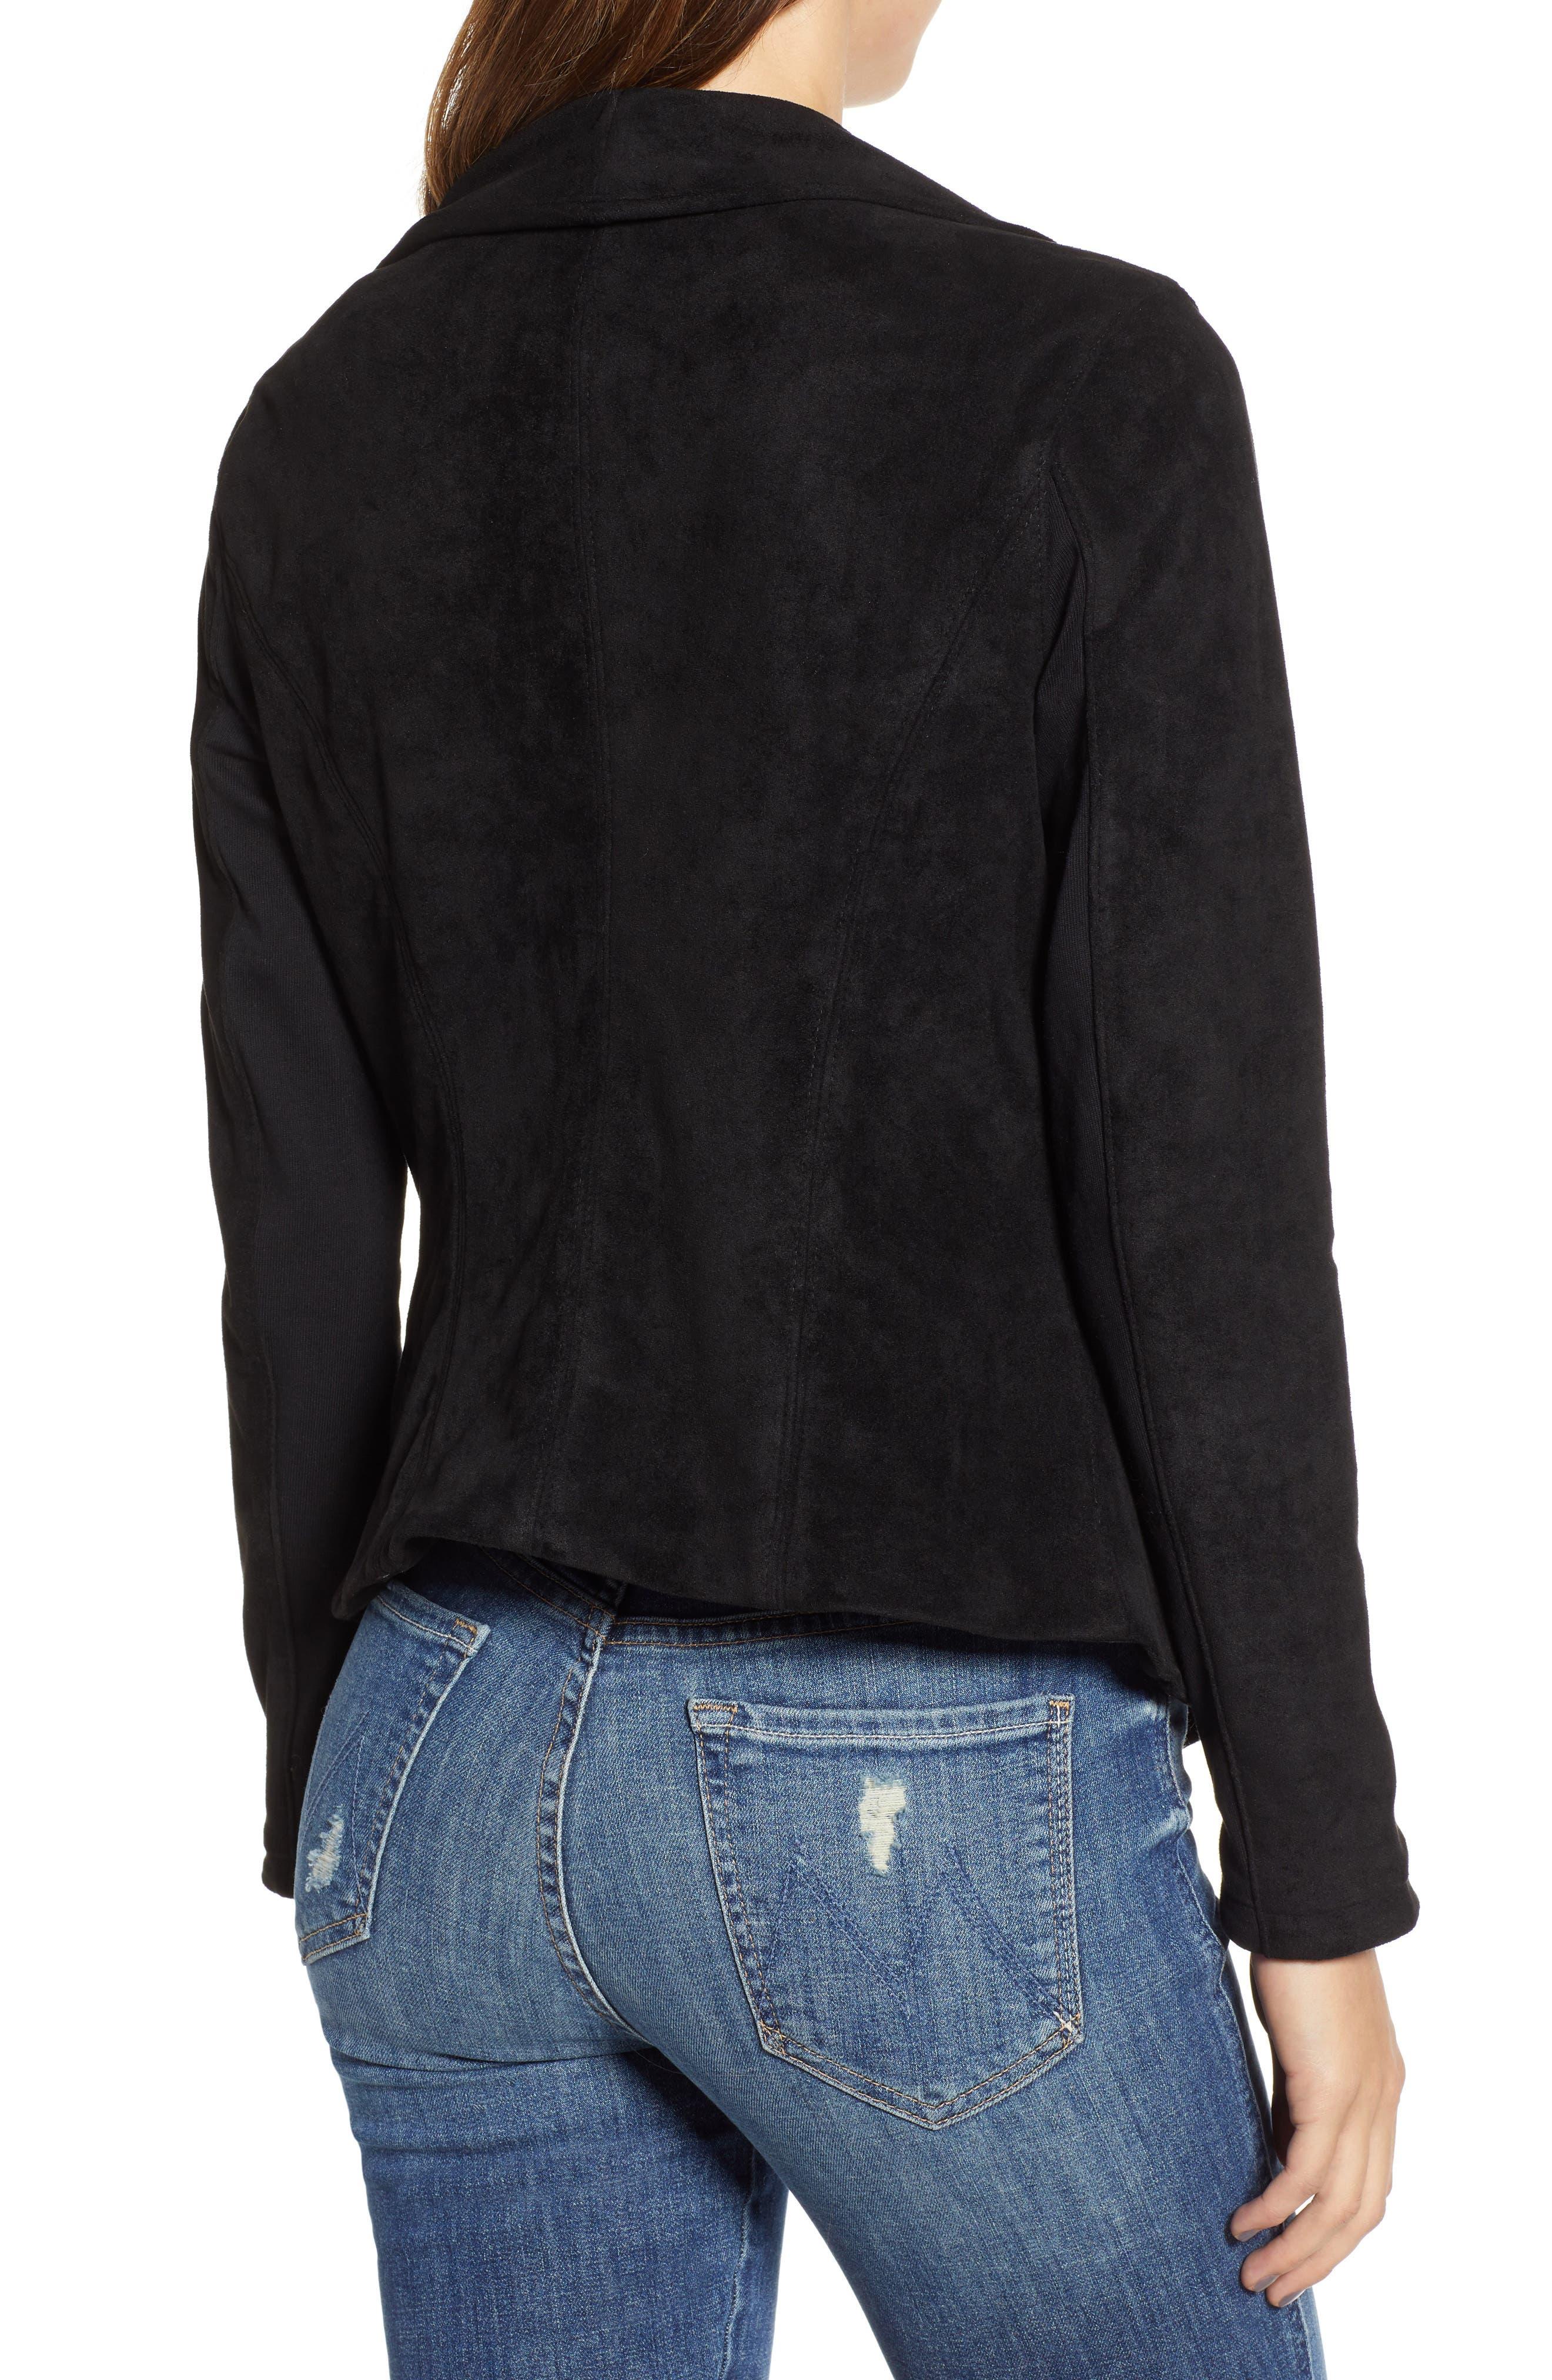 BLANKNYC, Legendary Faux Suede Jacket, Alternate thumbnail 2, color, 001